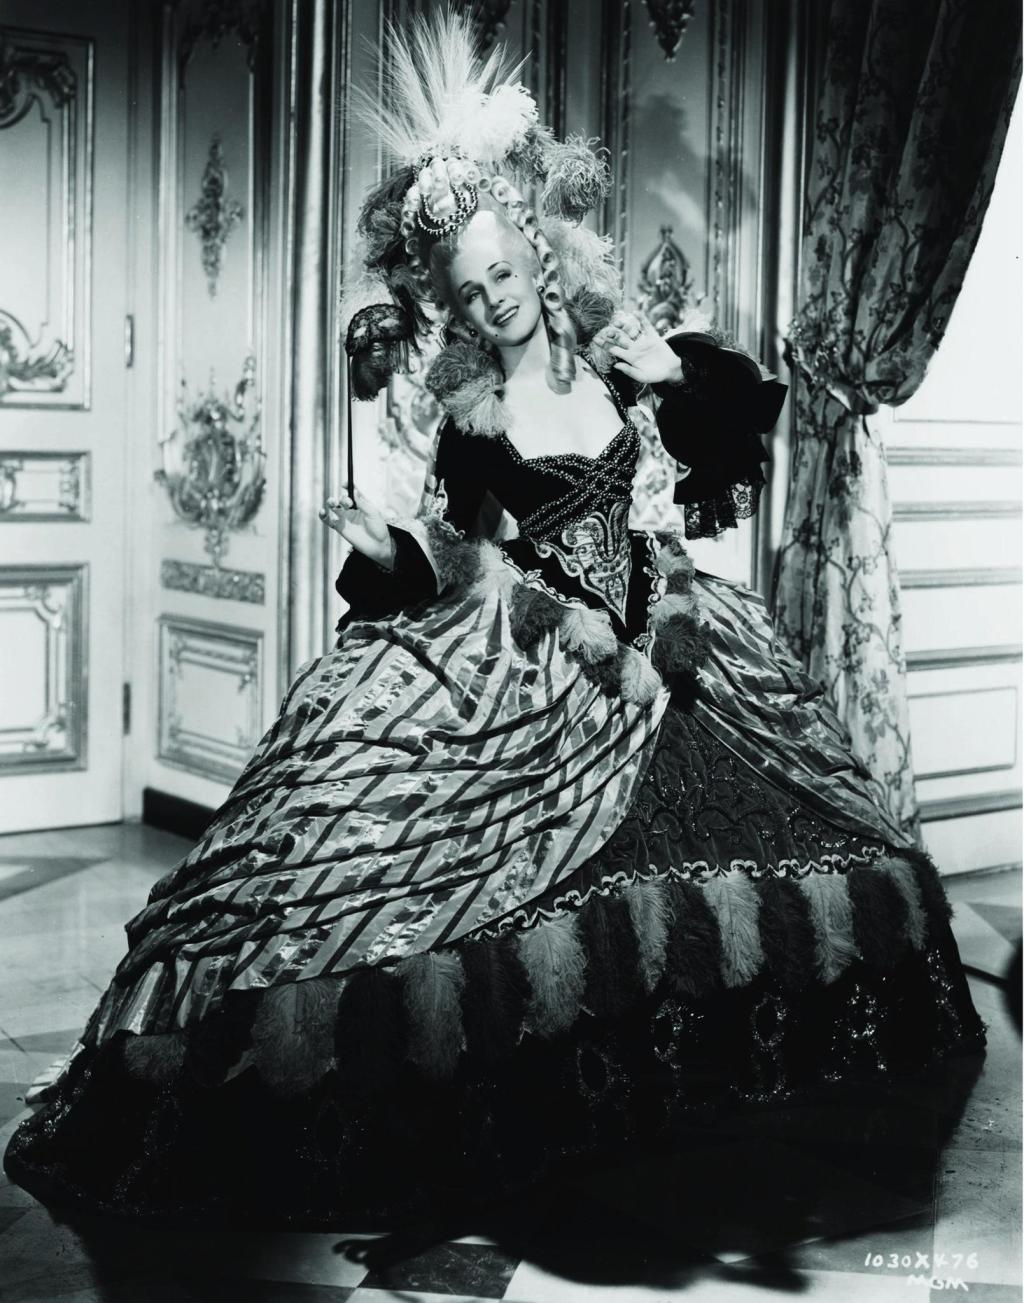 norma-shearer-in-marie-antoinette-(1938)